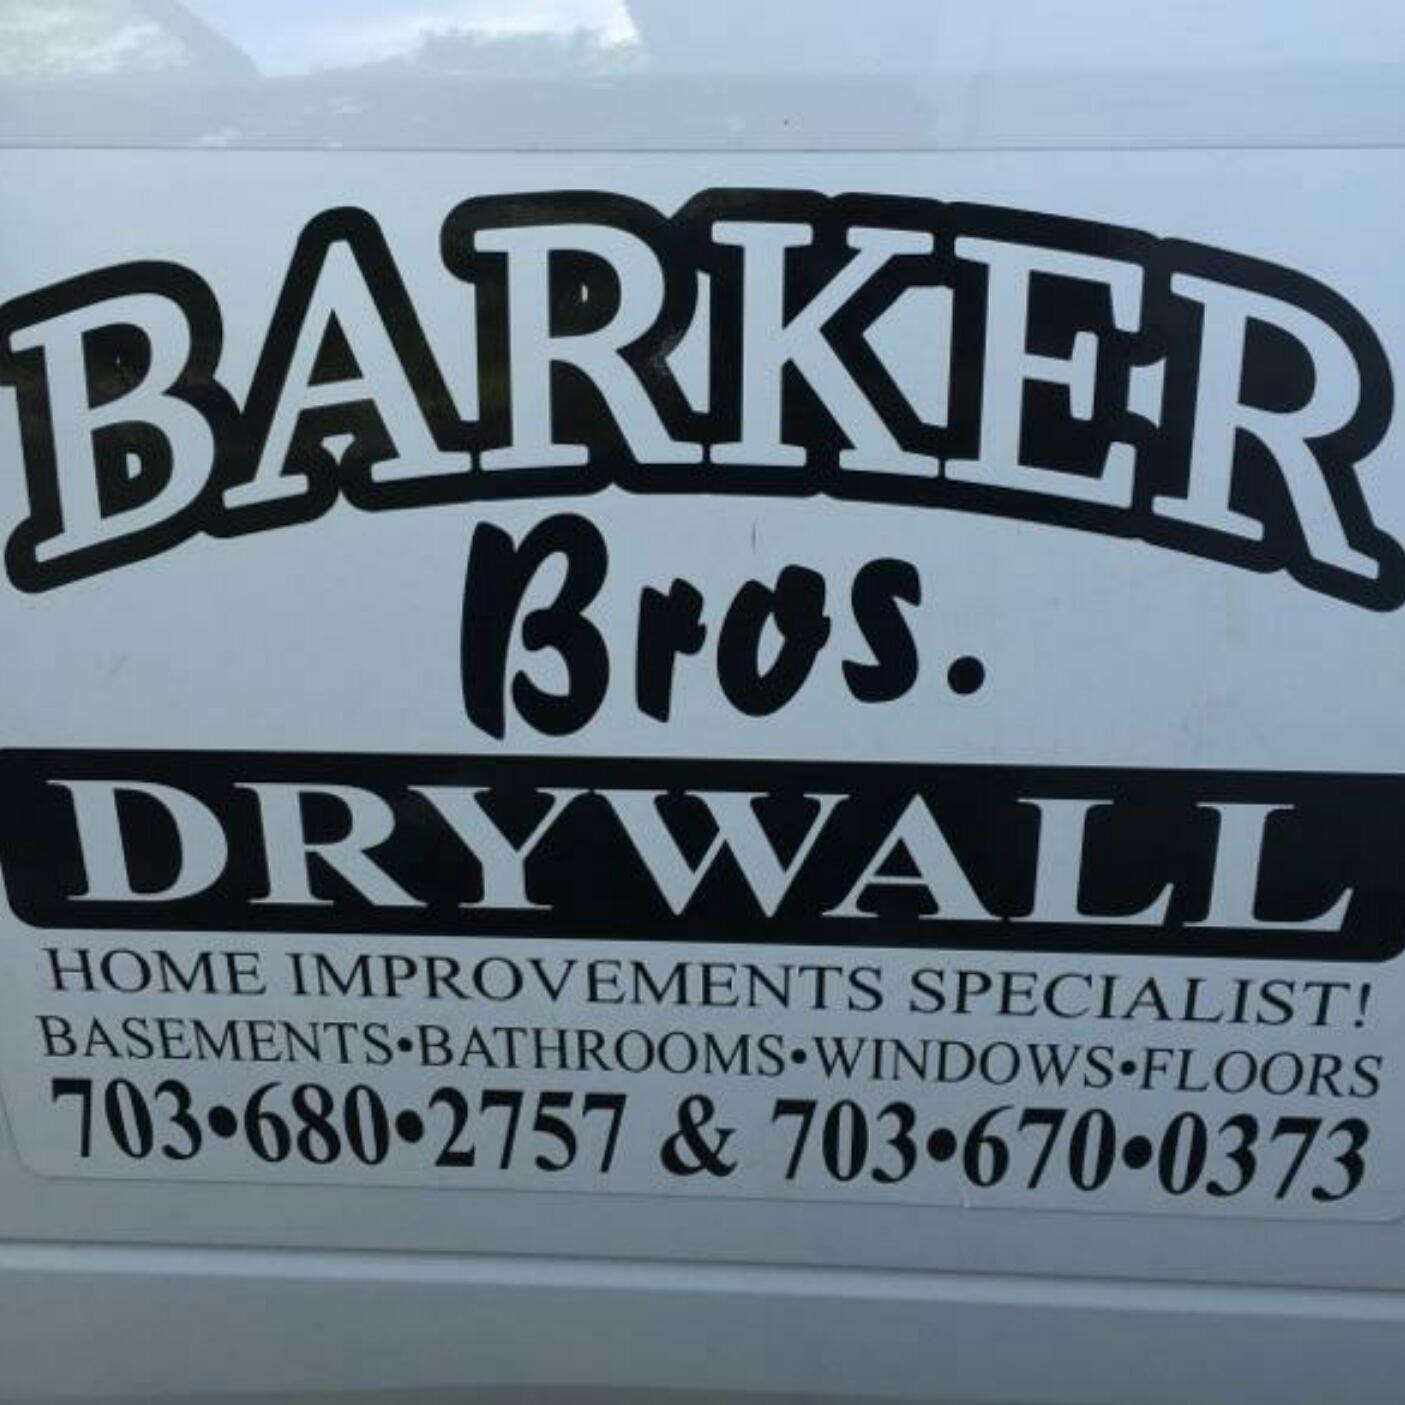 Barker Brothers Drywall LLC